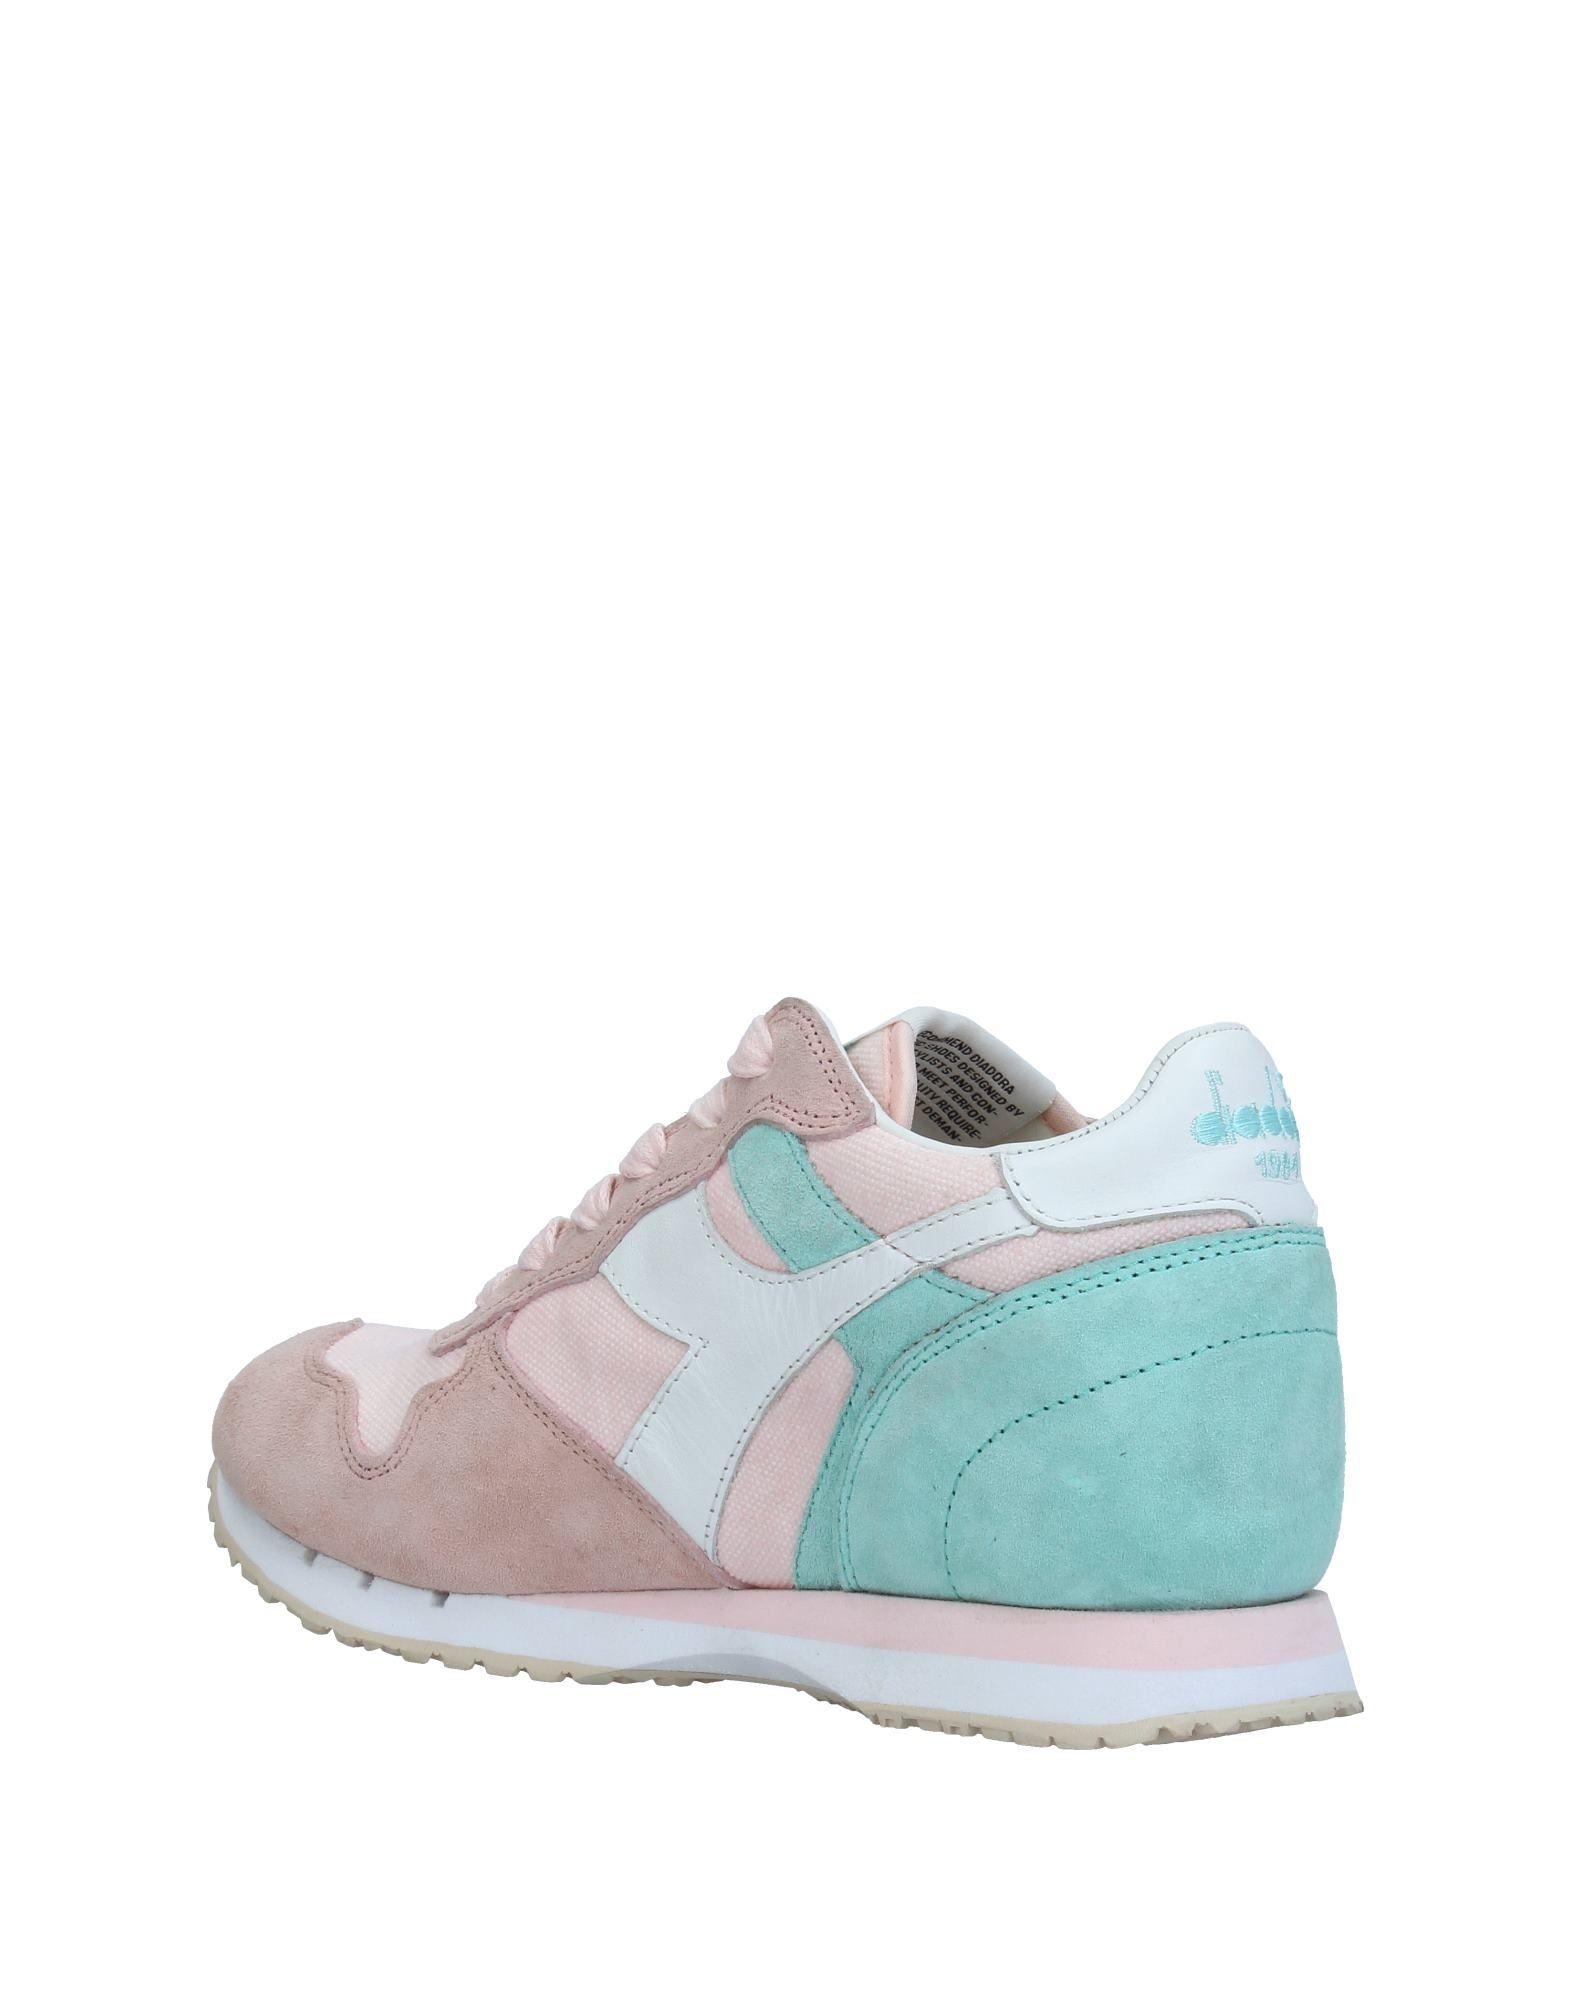 Diadora Heritage Sneakers Damen  11347077TU beliebte Gute Qualität beliebte 11347077TU Schuhe d6edc8